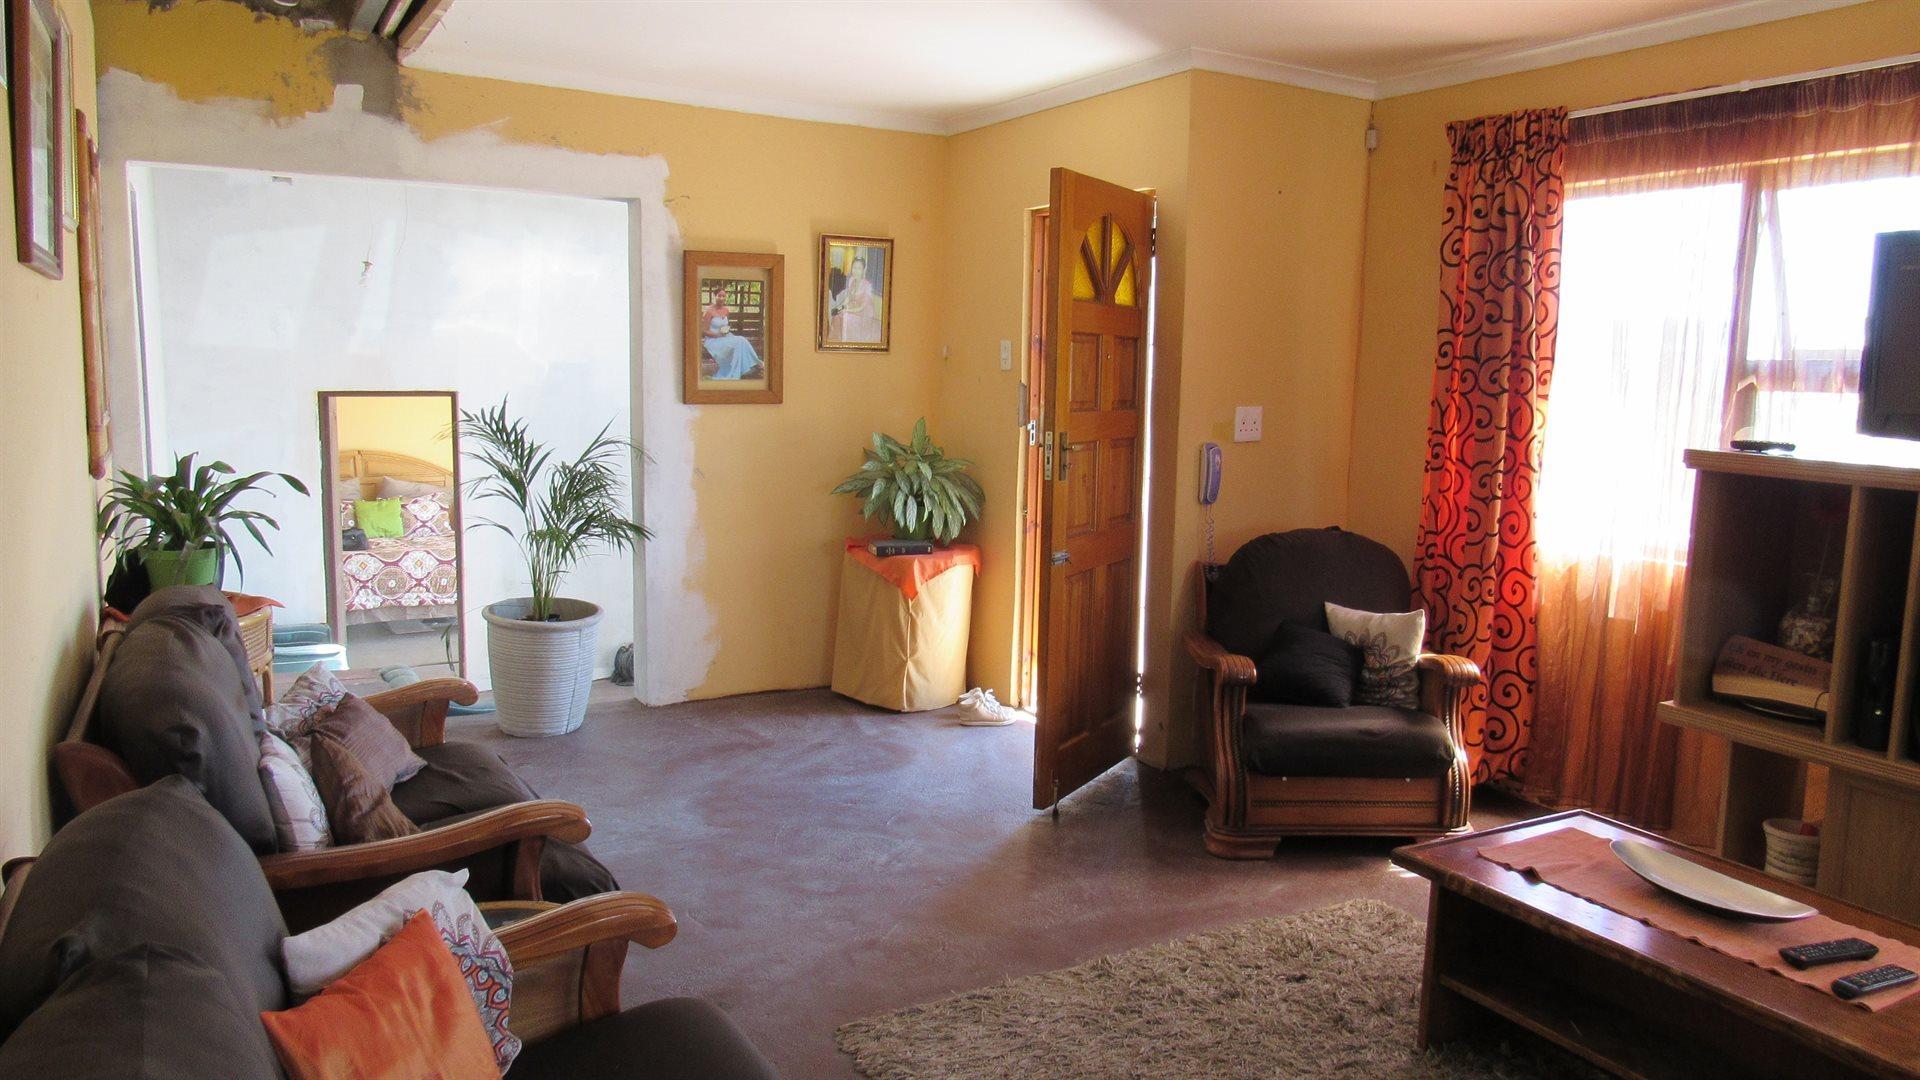 Eric Dodd property for sale. Ref No: 13573479. Picture no 4